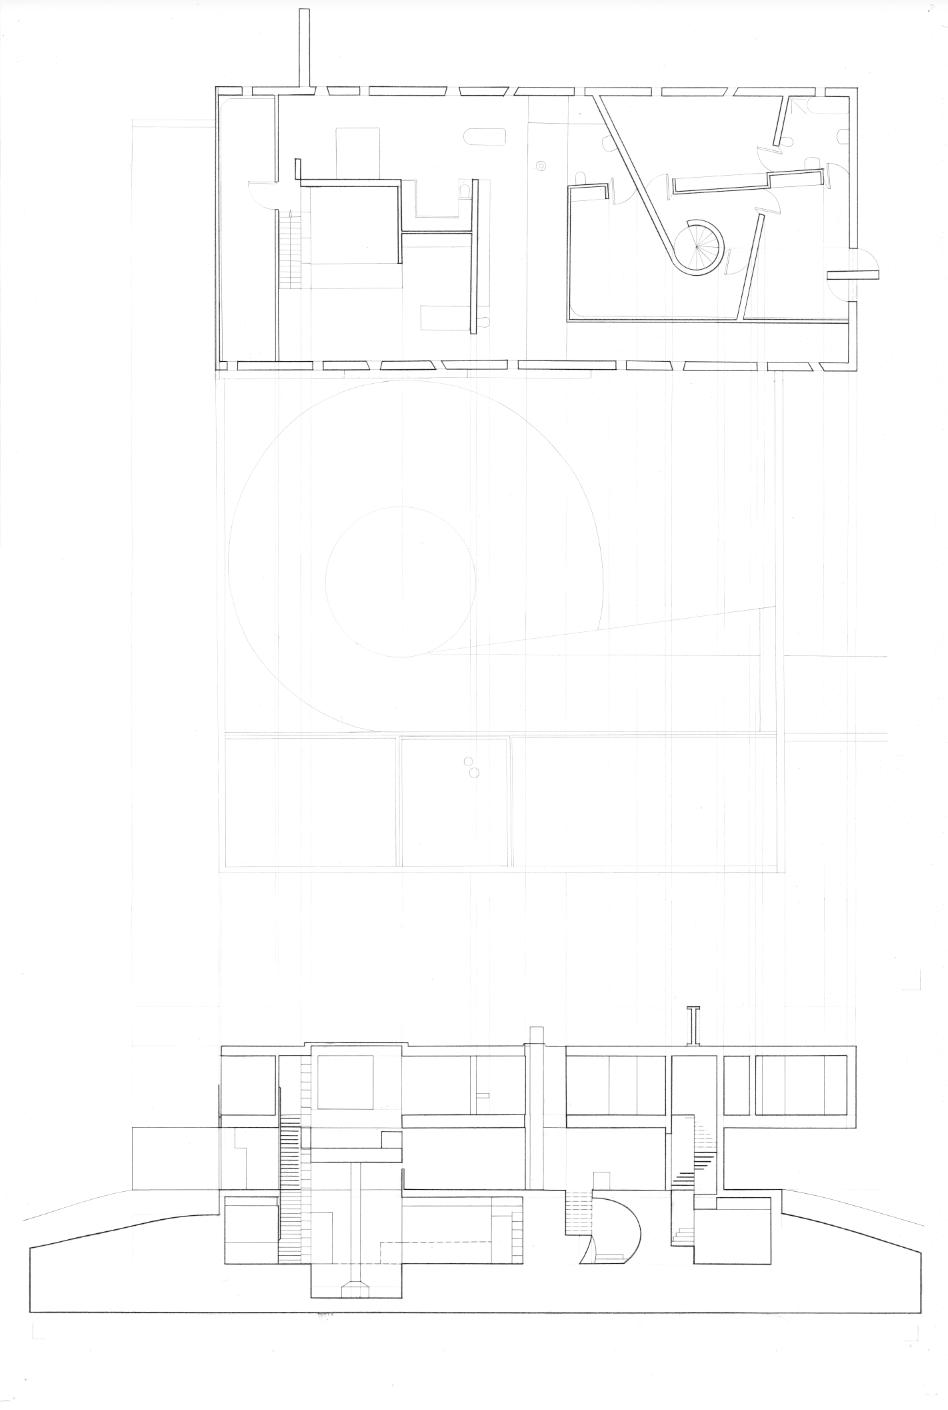 Third Floor Plan; Longitudinal Section